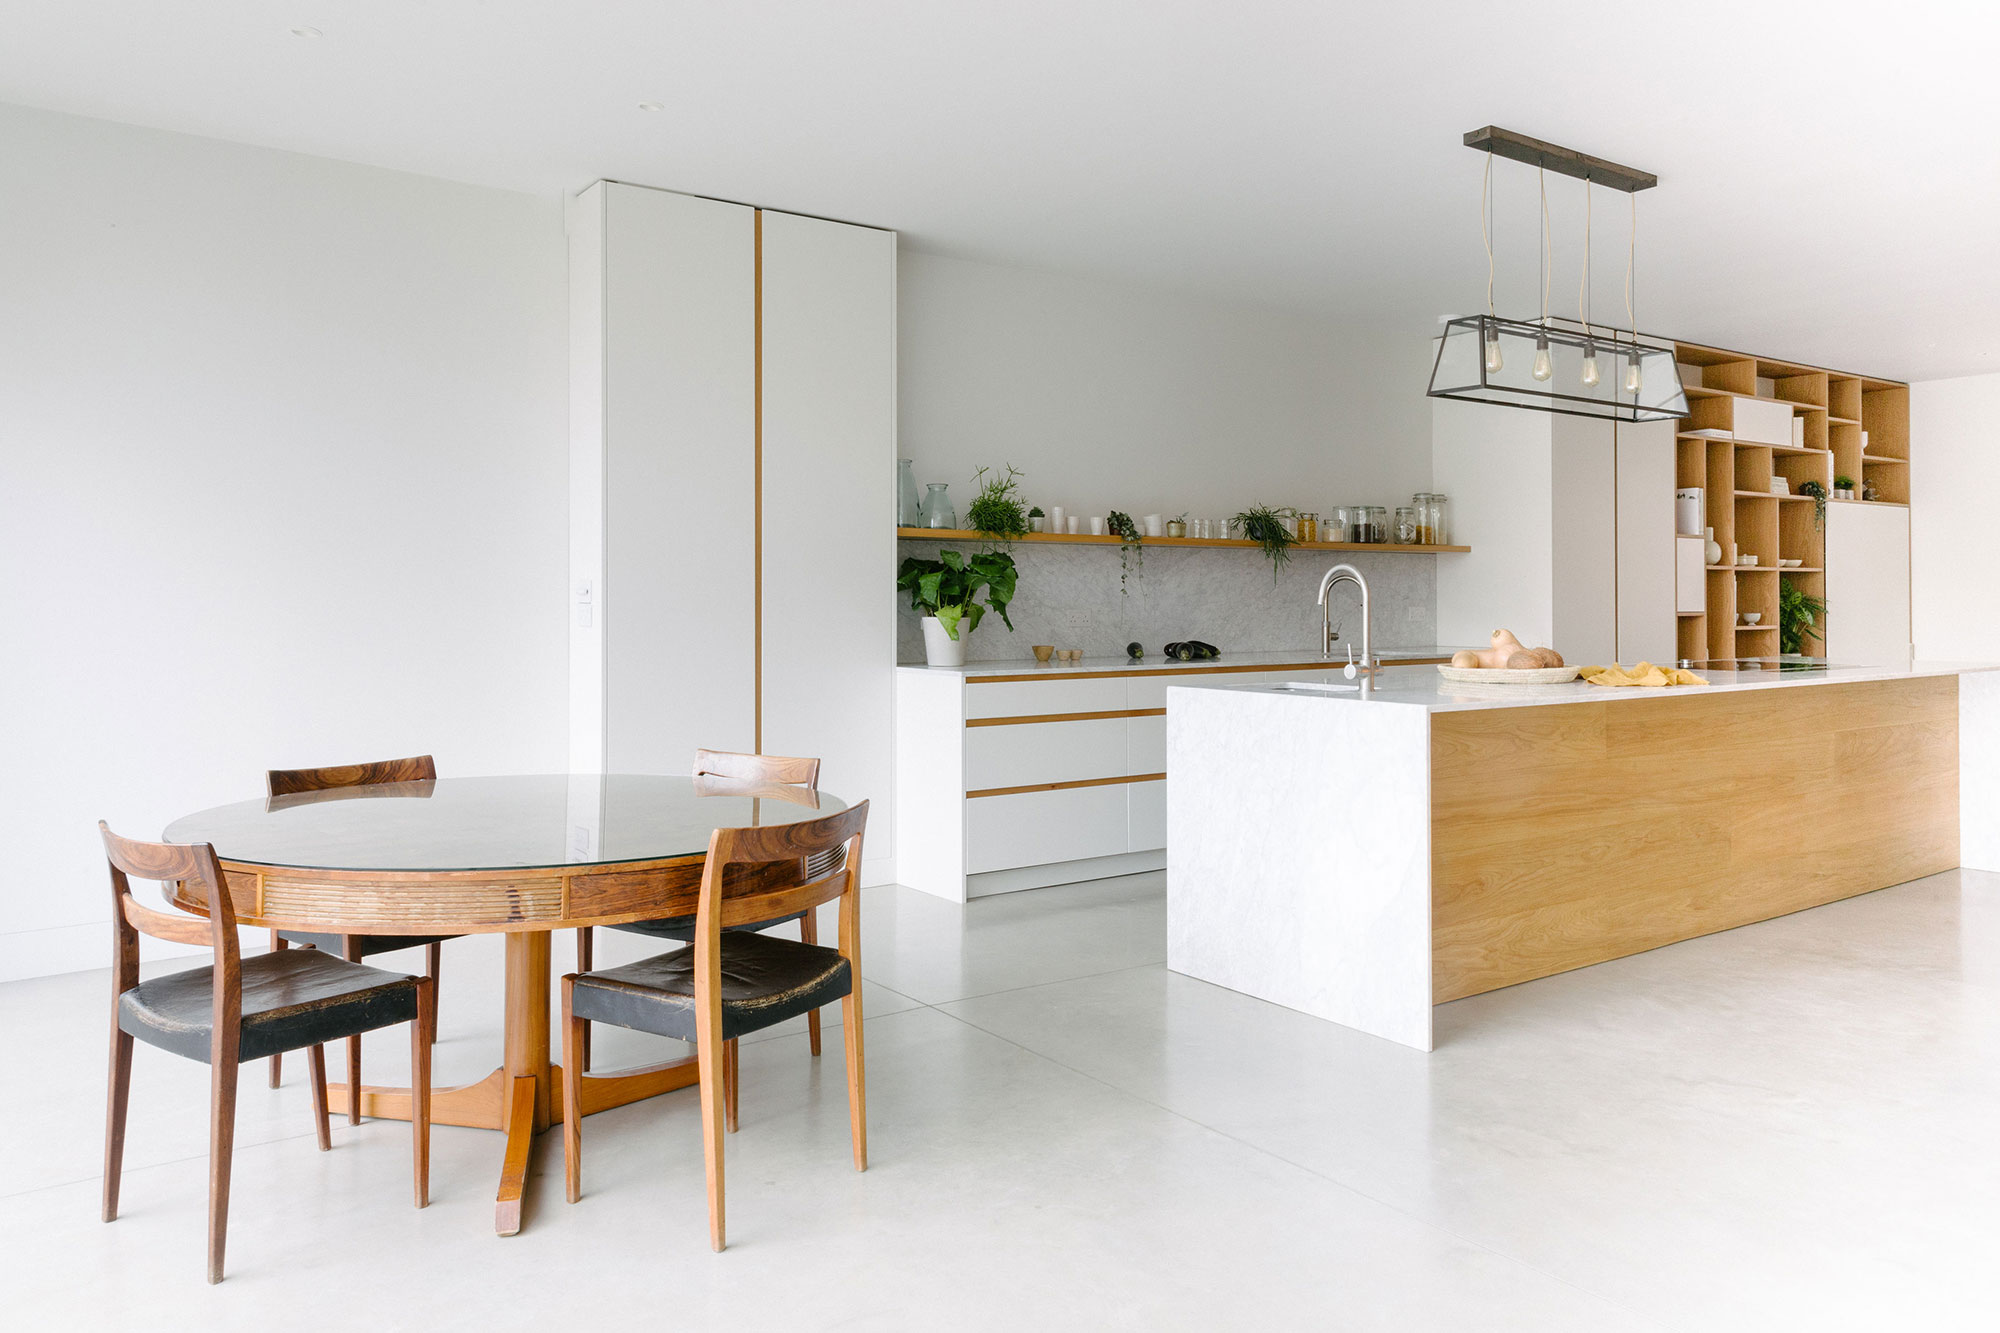 walnut cupboards, bespoke kitchens, brass, cupboard doors, west and reid, London kitchen